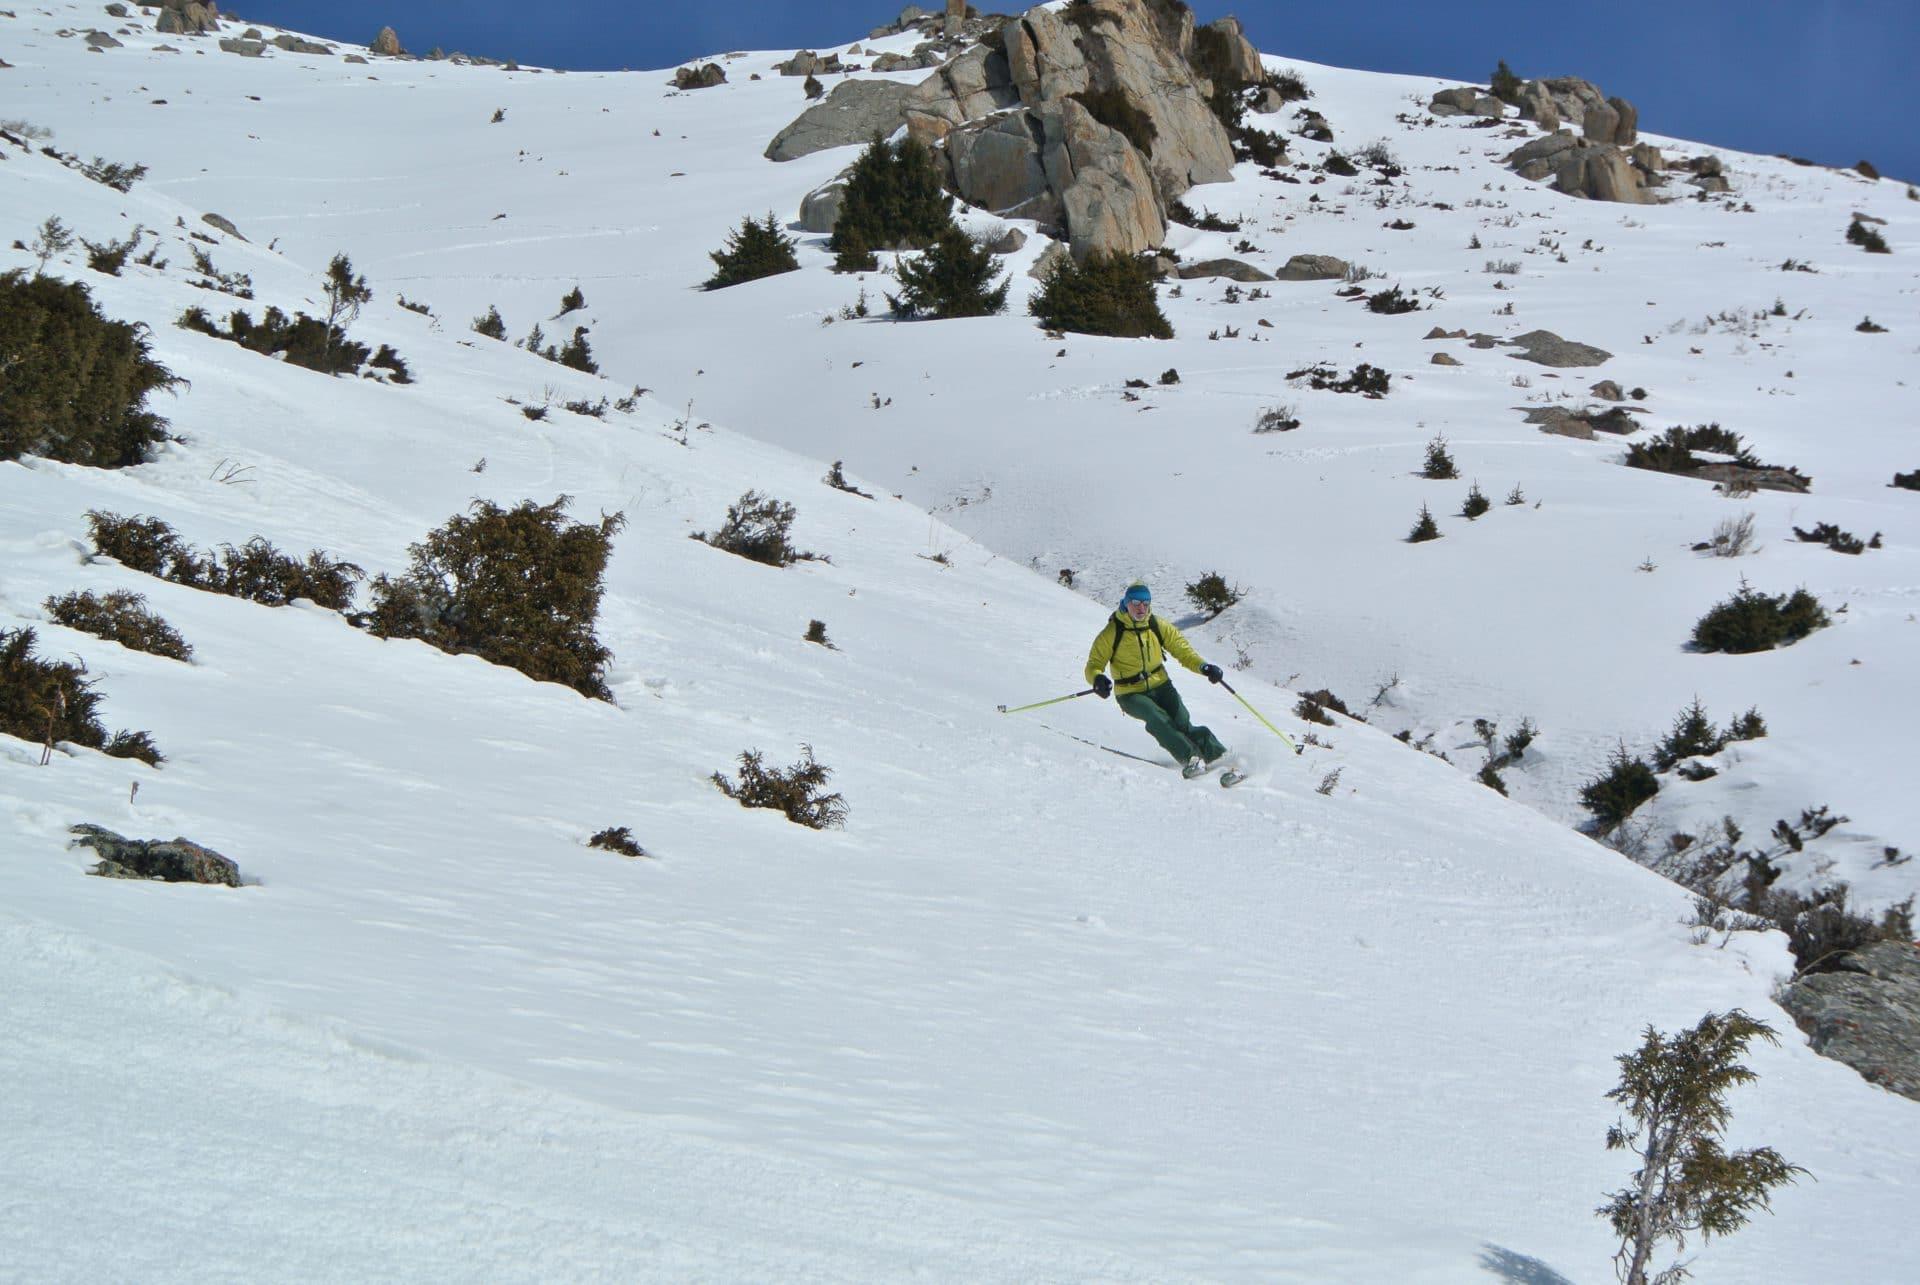 Helyum_Xavier-Carrard_Guide-de-montagne_Ski_Voyage_Kirghistan_Asie-Centrale_Face-sud_Didier-Genecand_Radys